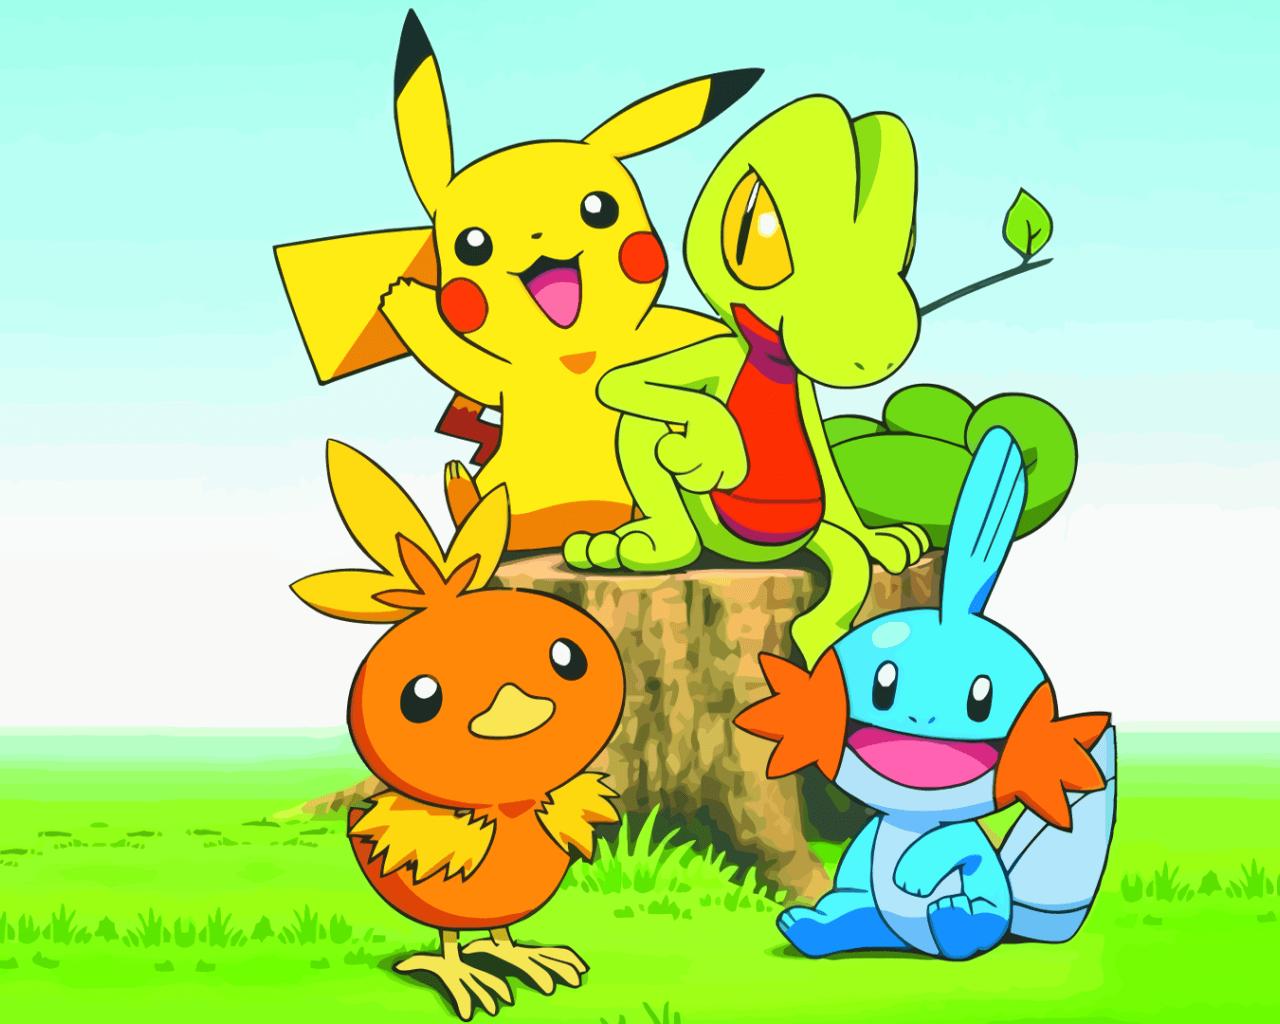 Pokemon Pikachu Wallpapers Wallpaper Cave